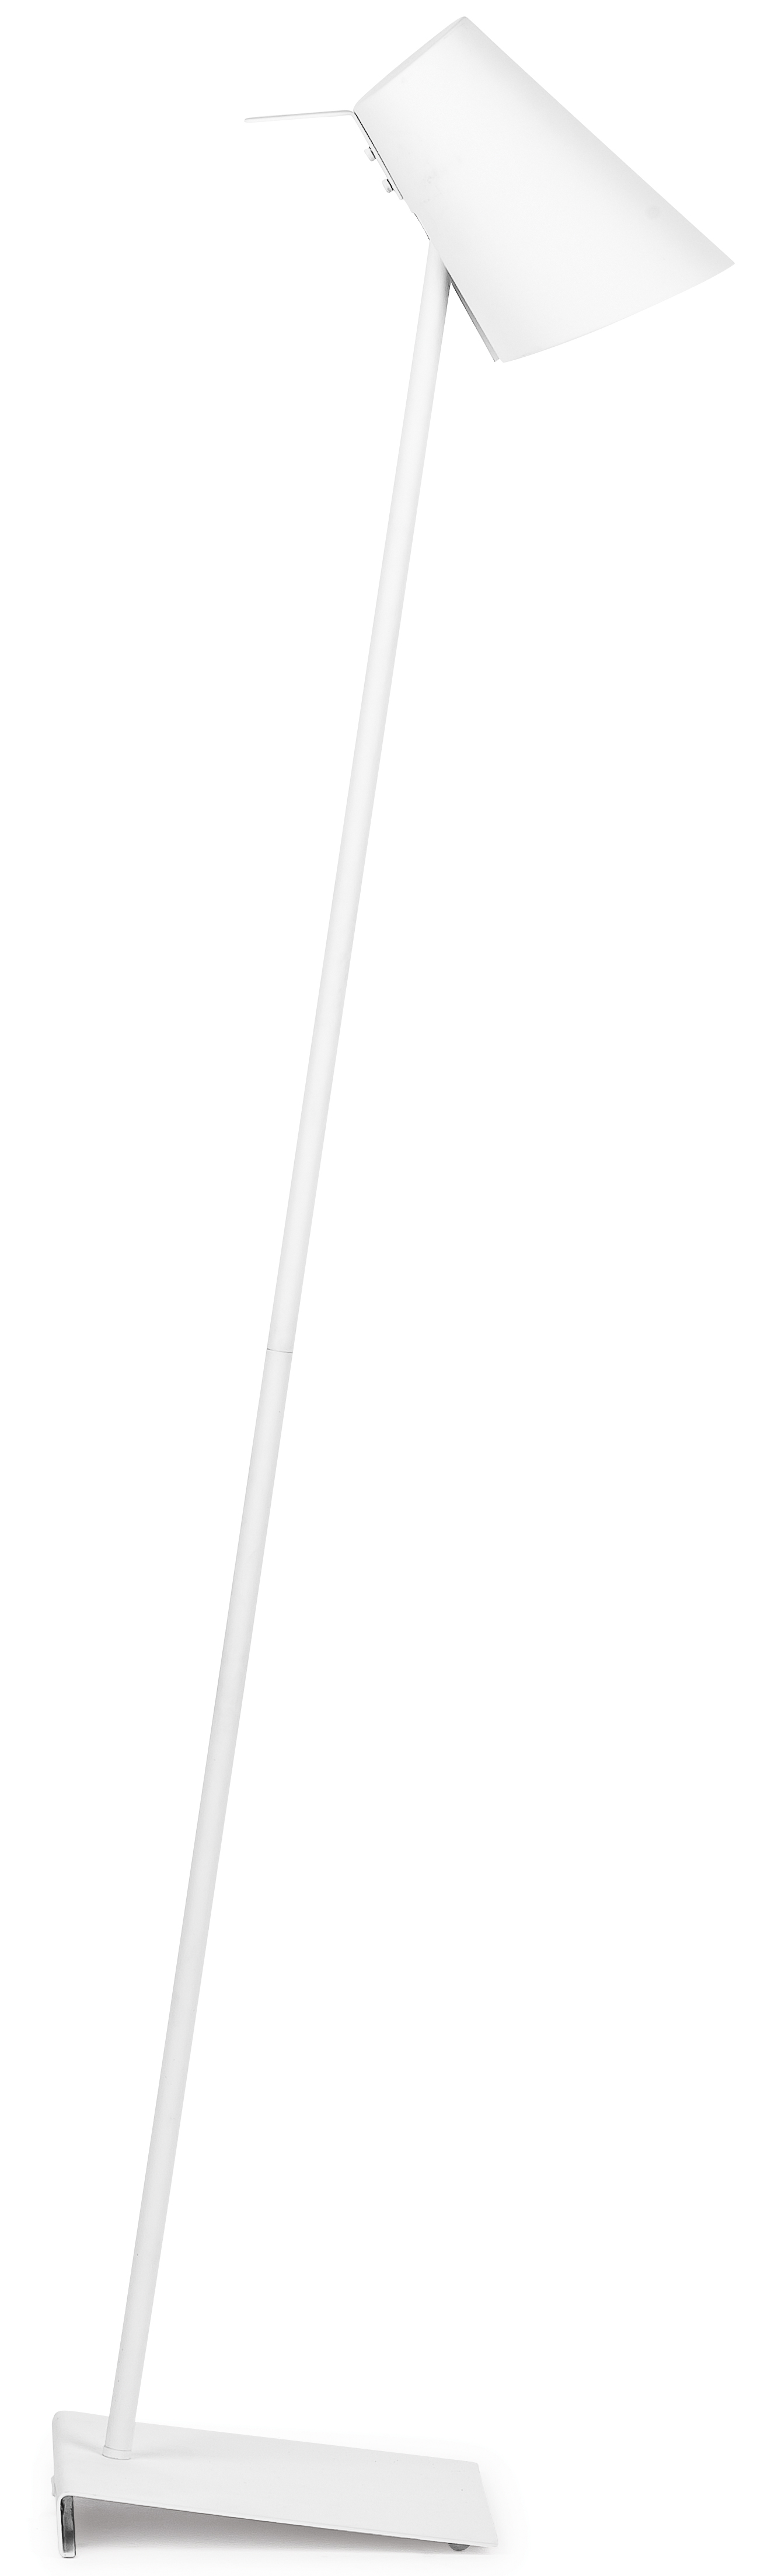 Lampadaire blanc finition gomme H139cm